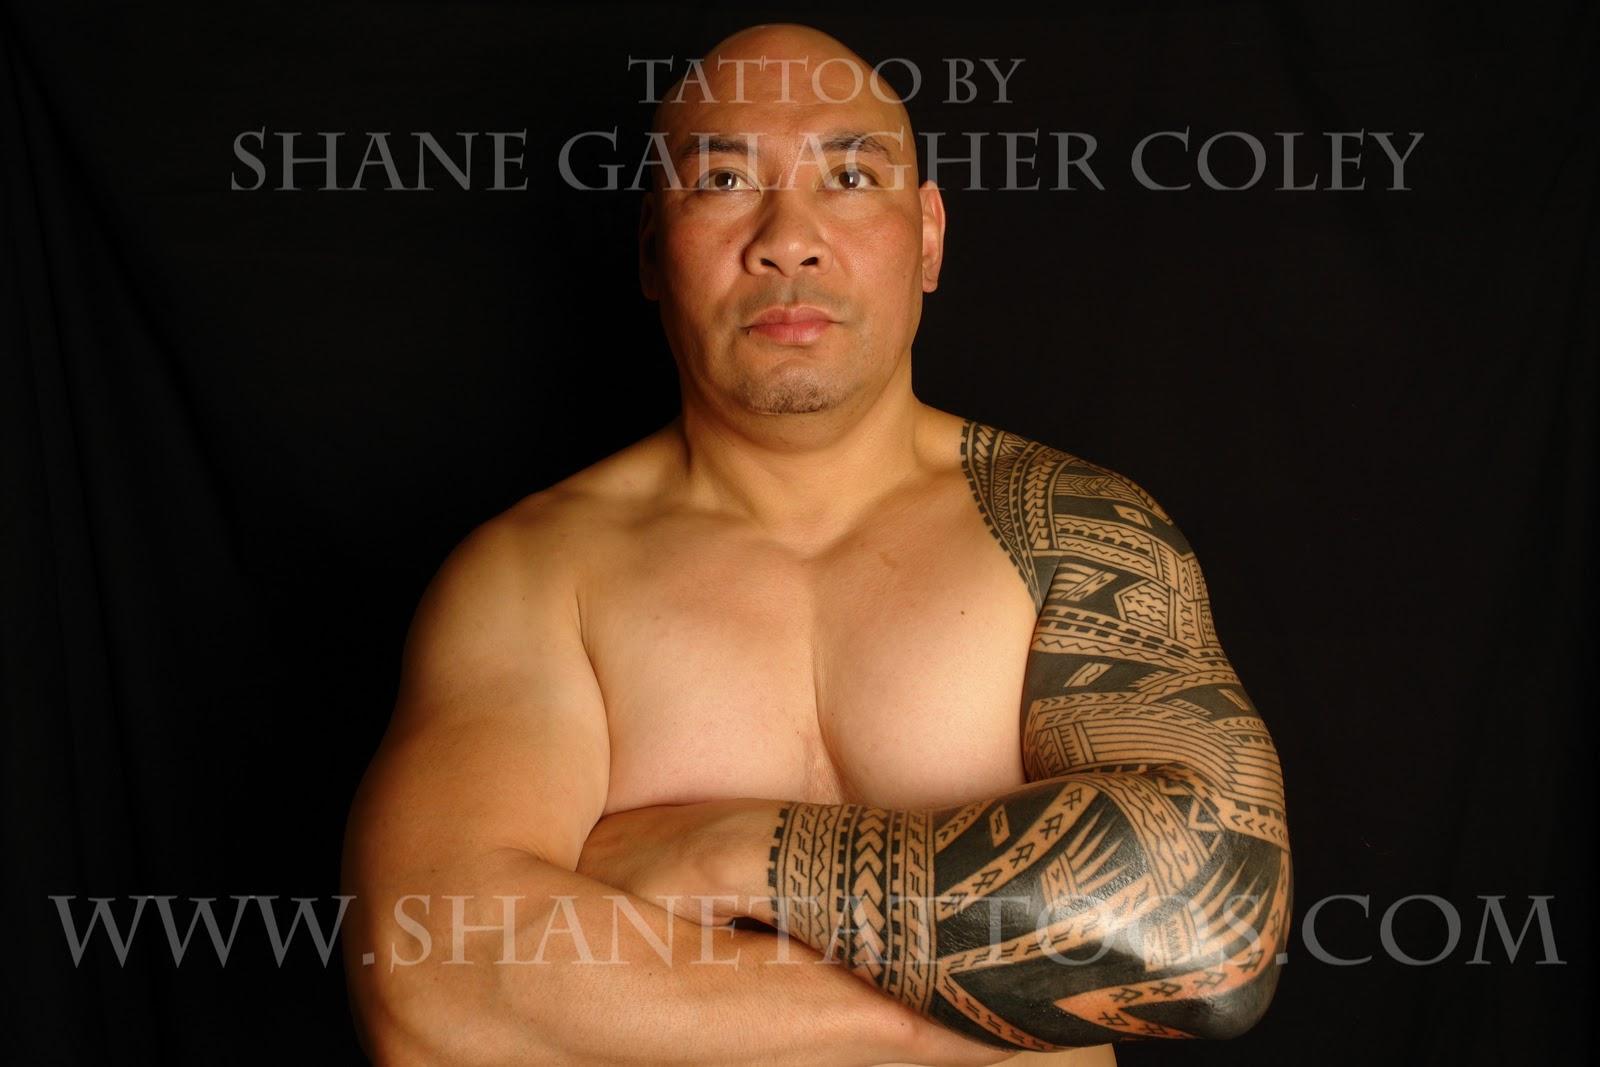 SHANE TATTOOS Polynesian/Samoan Sleeve Tattoo On Sonny